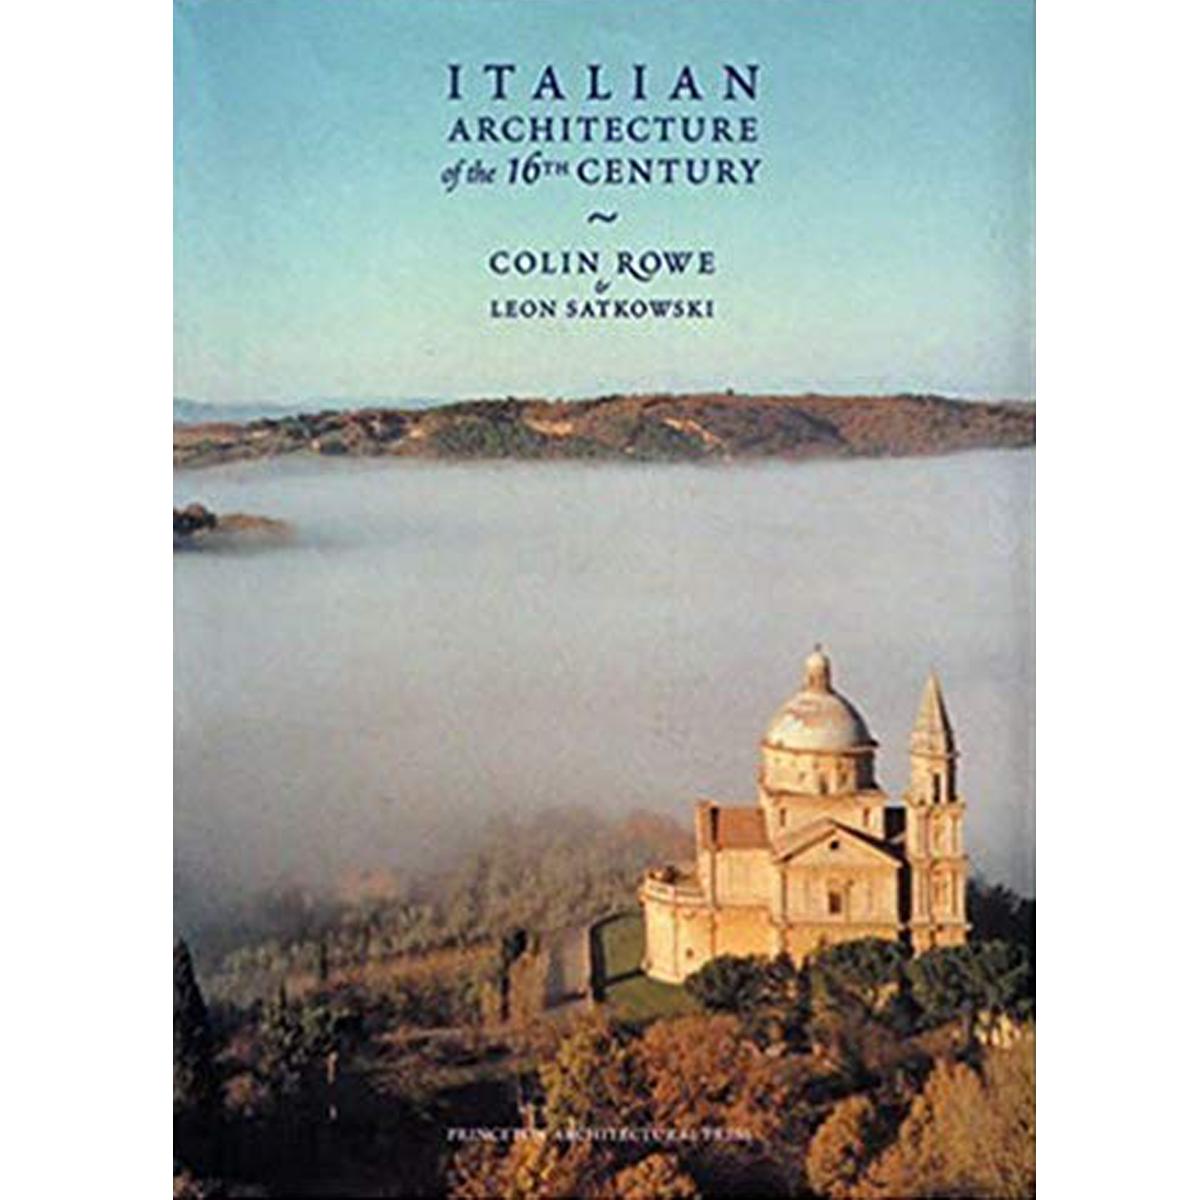 Italian Architecture of the 16th Century